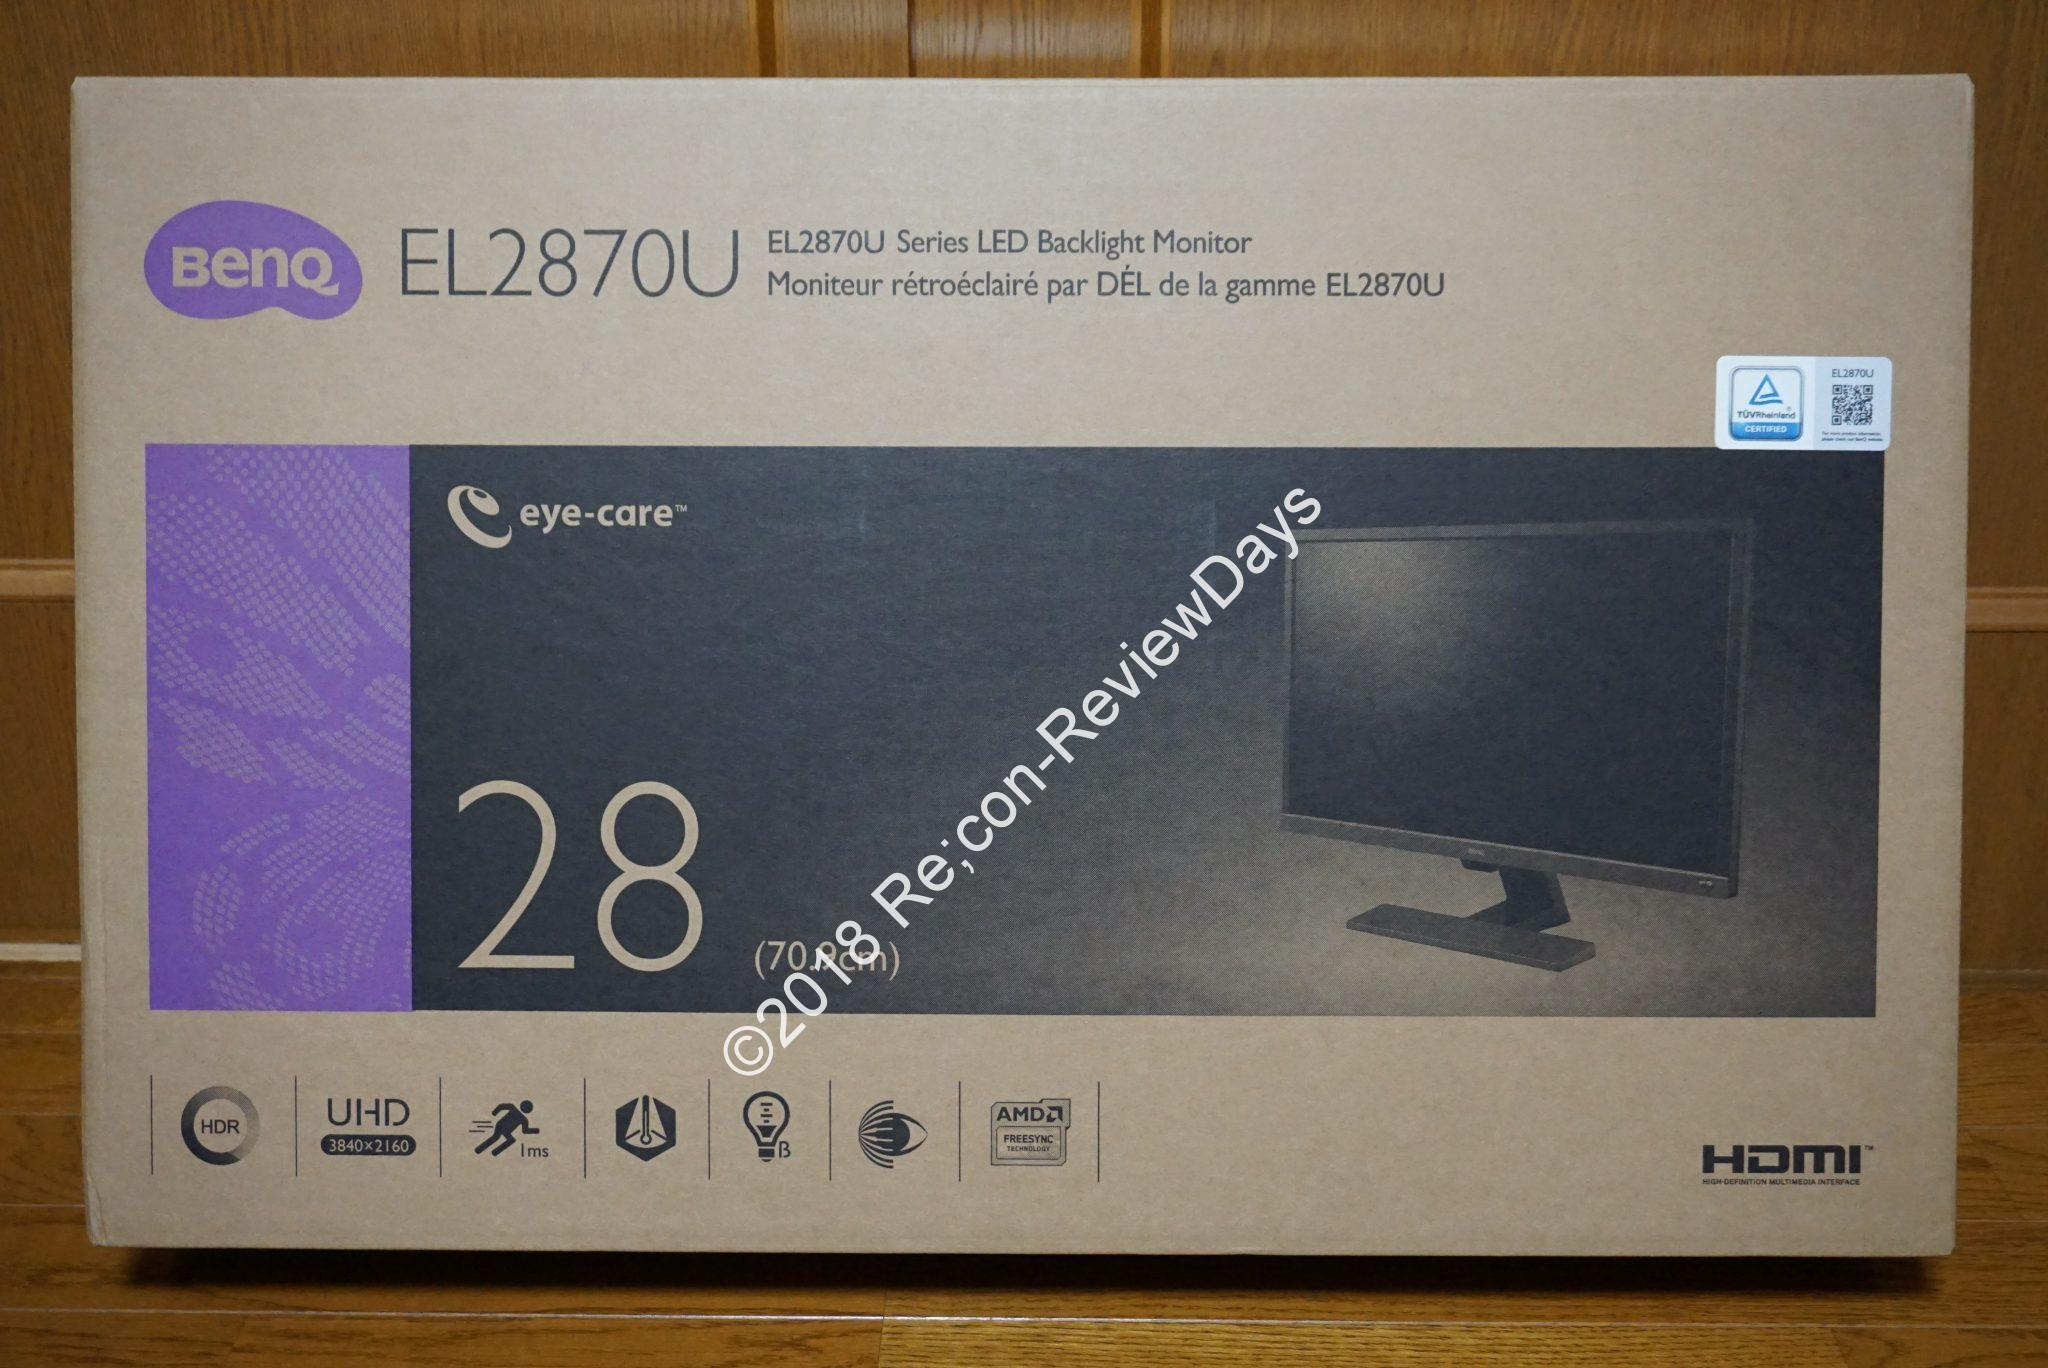 BenQ 27.9型の4K HDR対応ゲーミングディスプレイ「EL2870U」の使い勝手をチェックする #BenQ #4K2K #ディスプレイ #ゲーミング